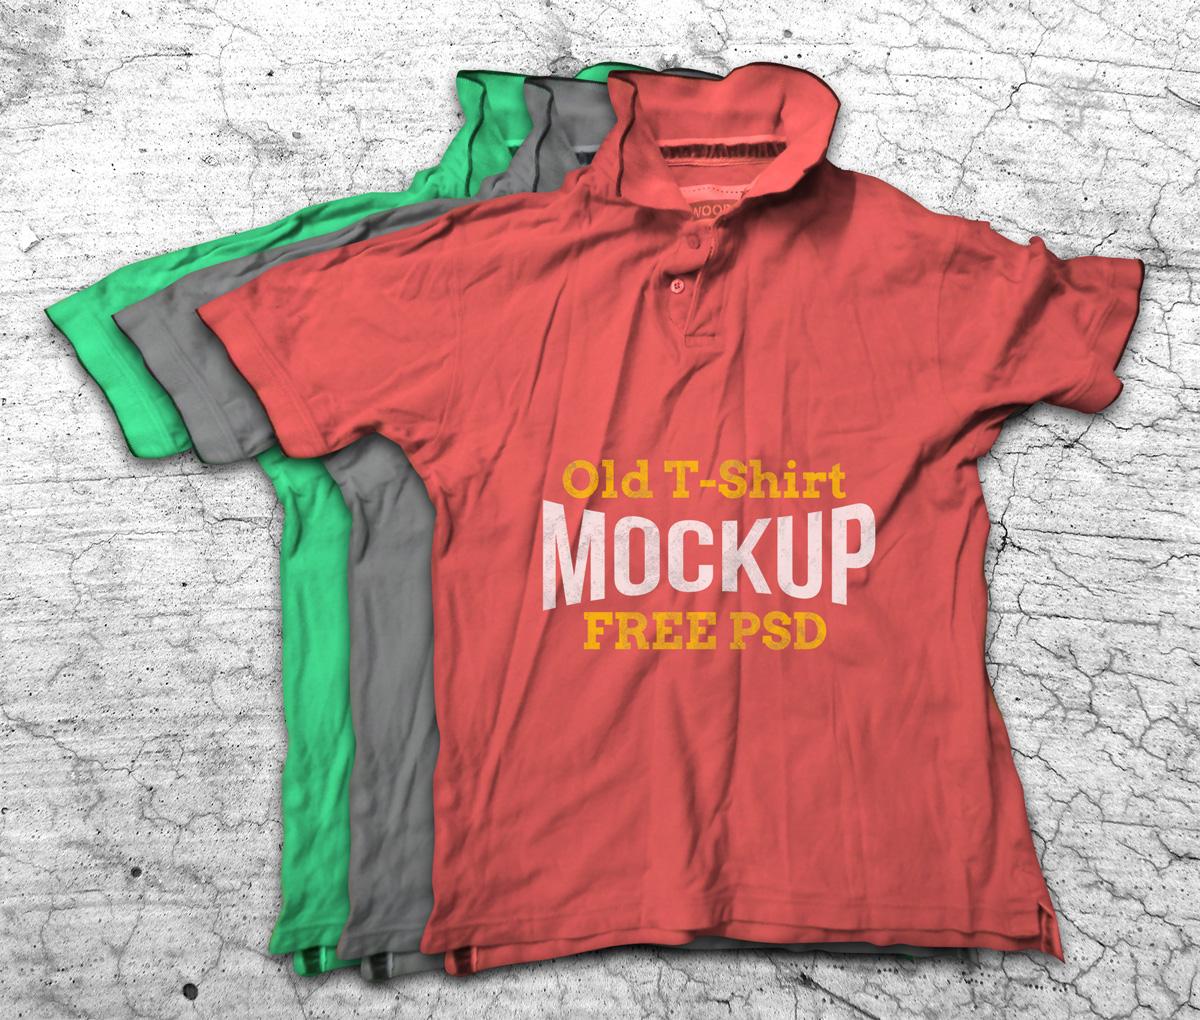 Black t shirt mockup psd free - Black T Shirt Mockup Psd Free 45